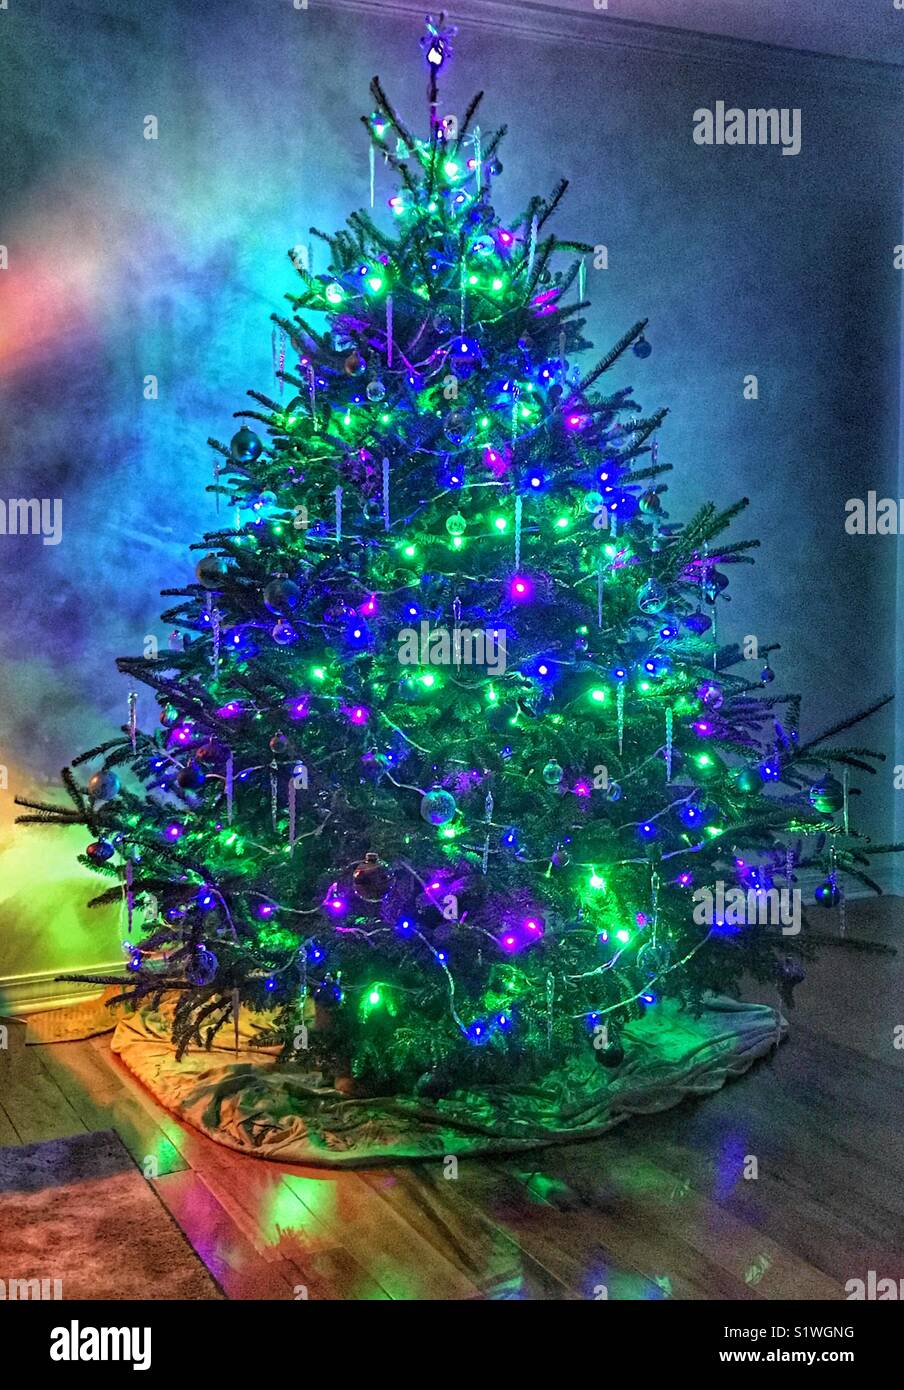 Magical Christmas Tree With A Rainbow Glow Stock Photo 310963228